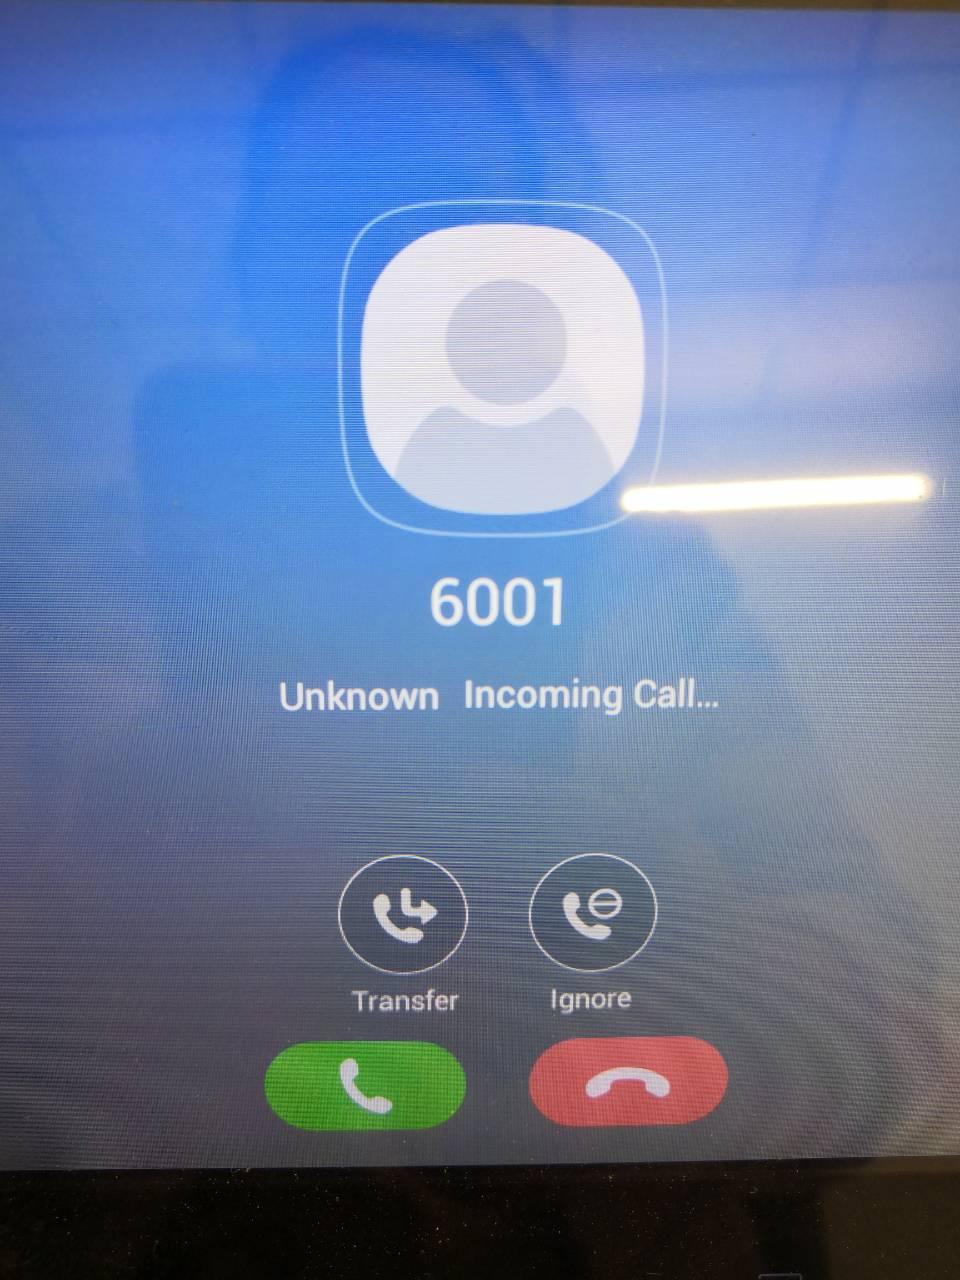 114312b13ruzp1f135pep5.jpg?Phone number